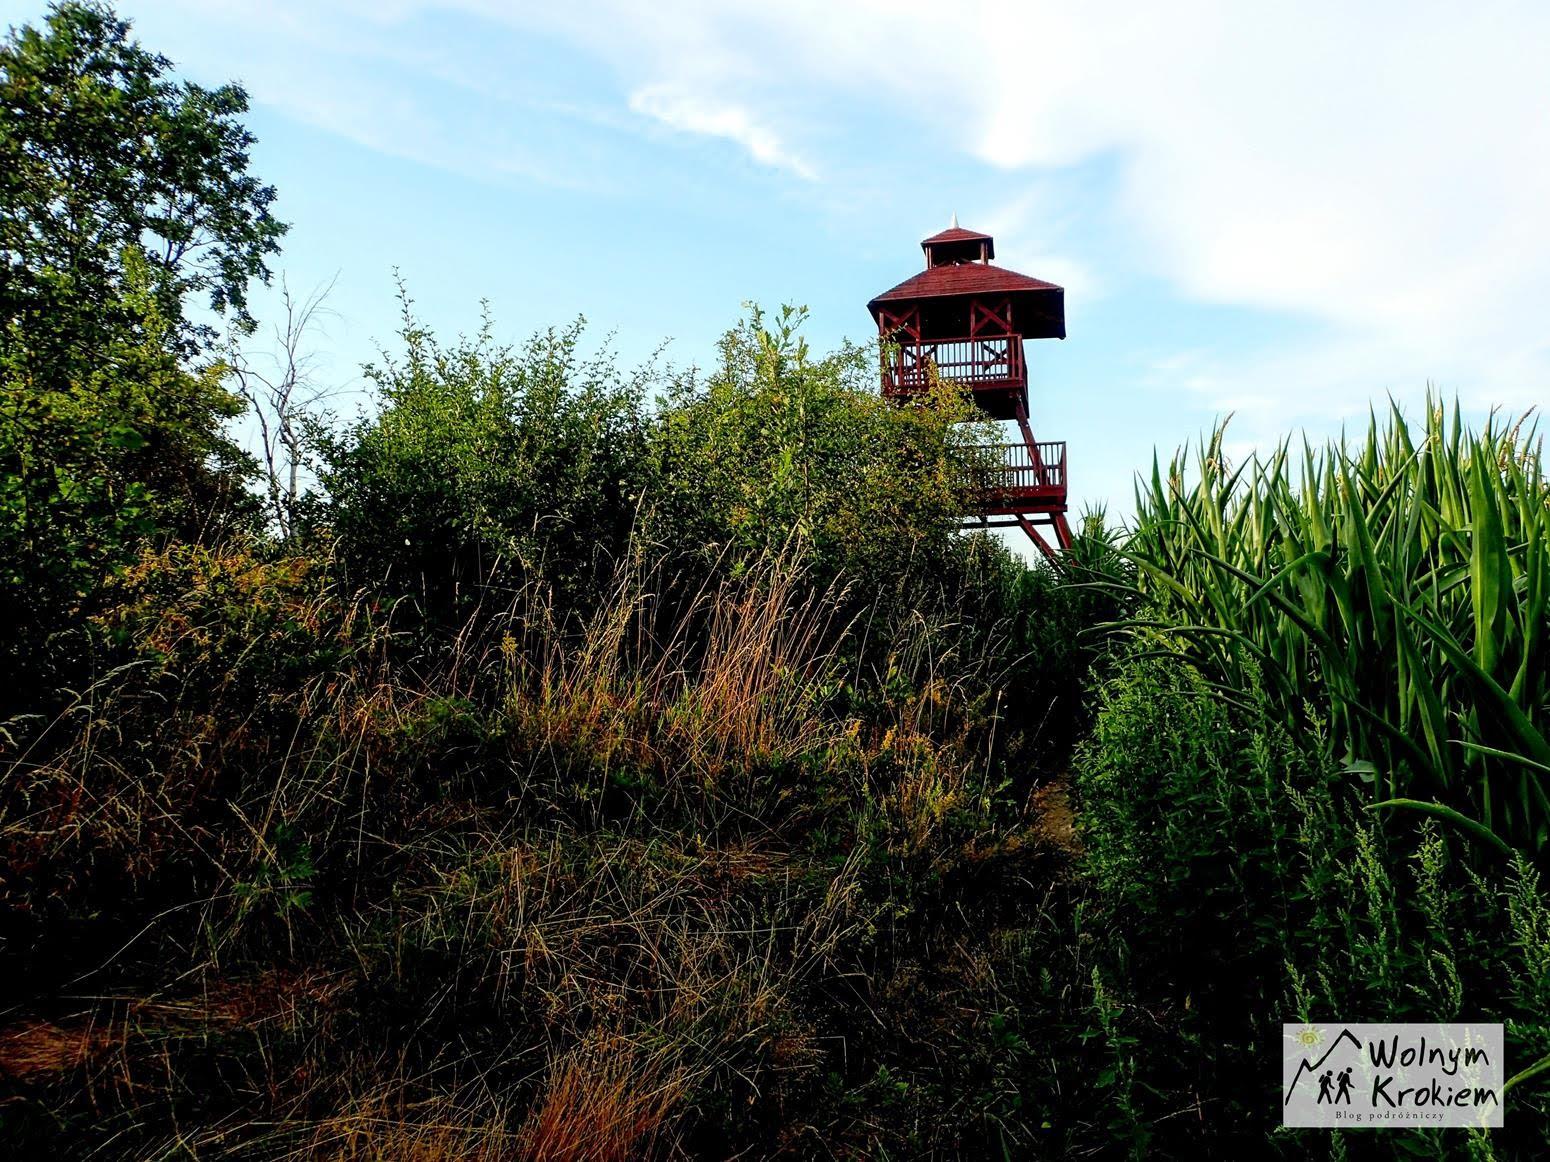 Kawia Gora Wieza widokowa